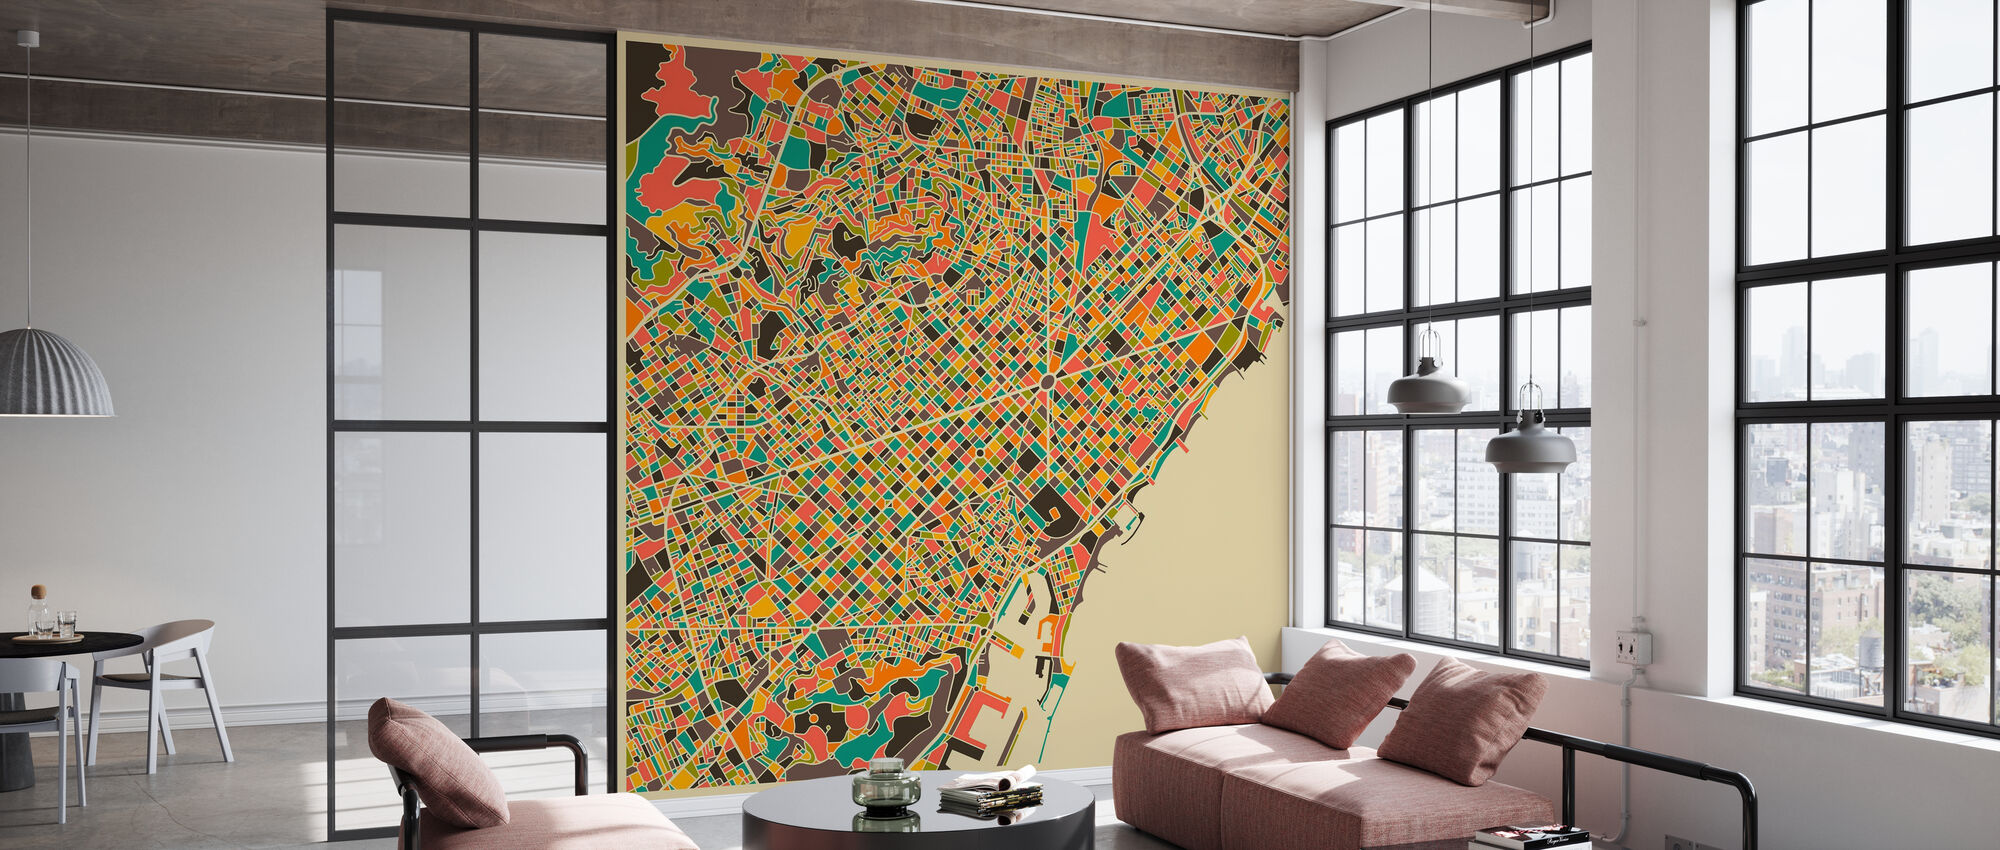 Multicolor Map - Barcelona - Wallpaper - Office